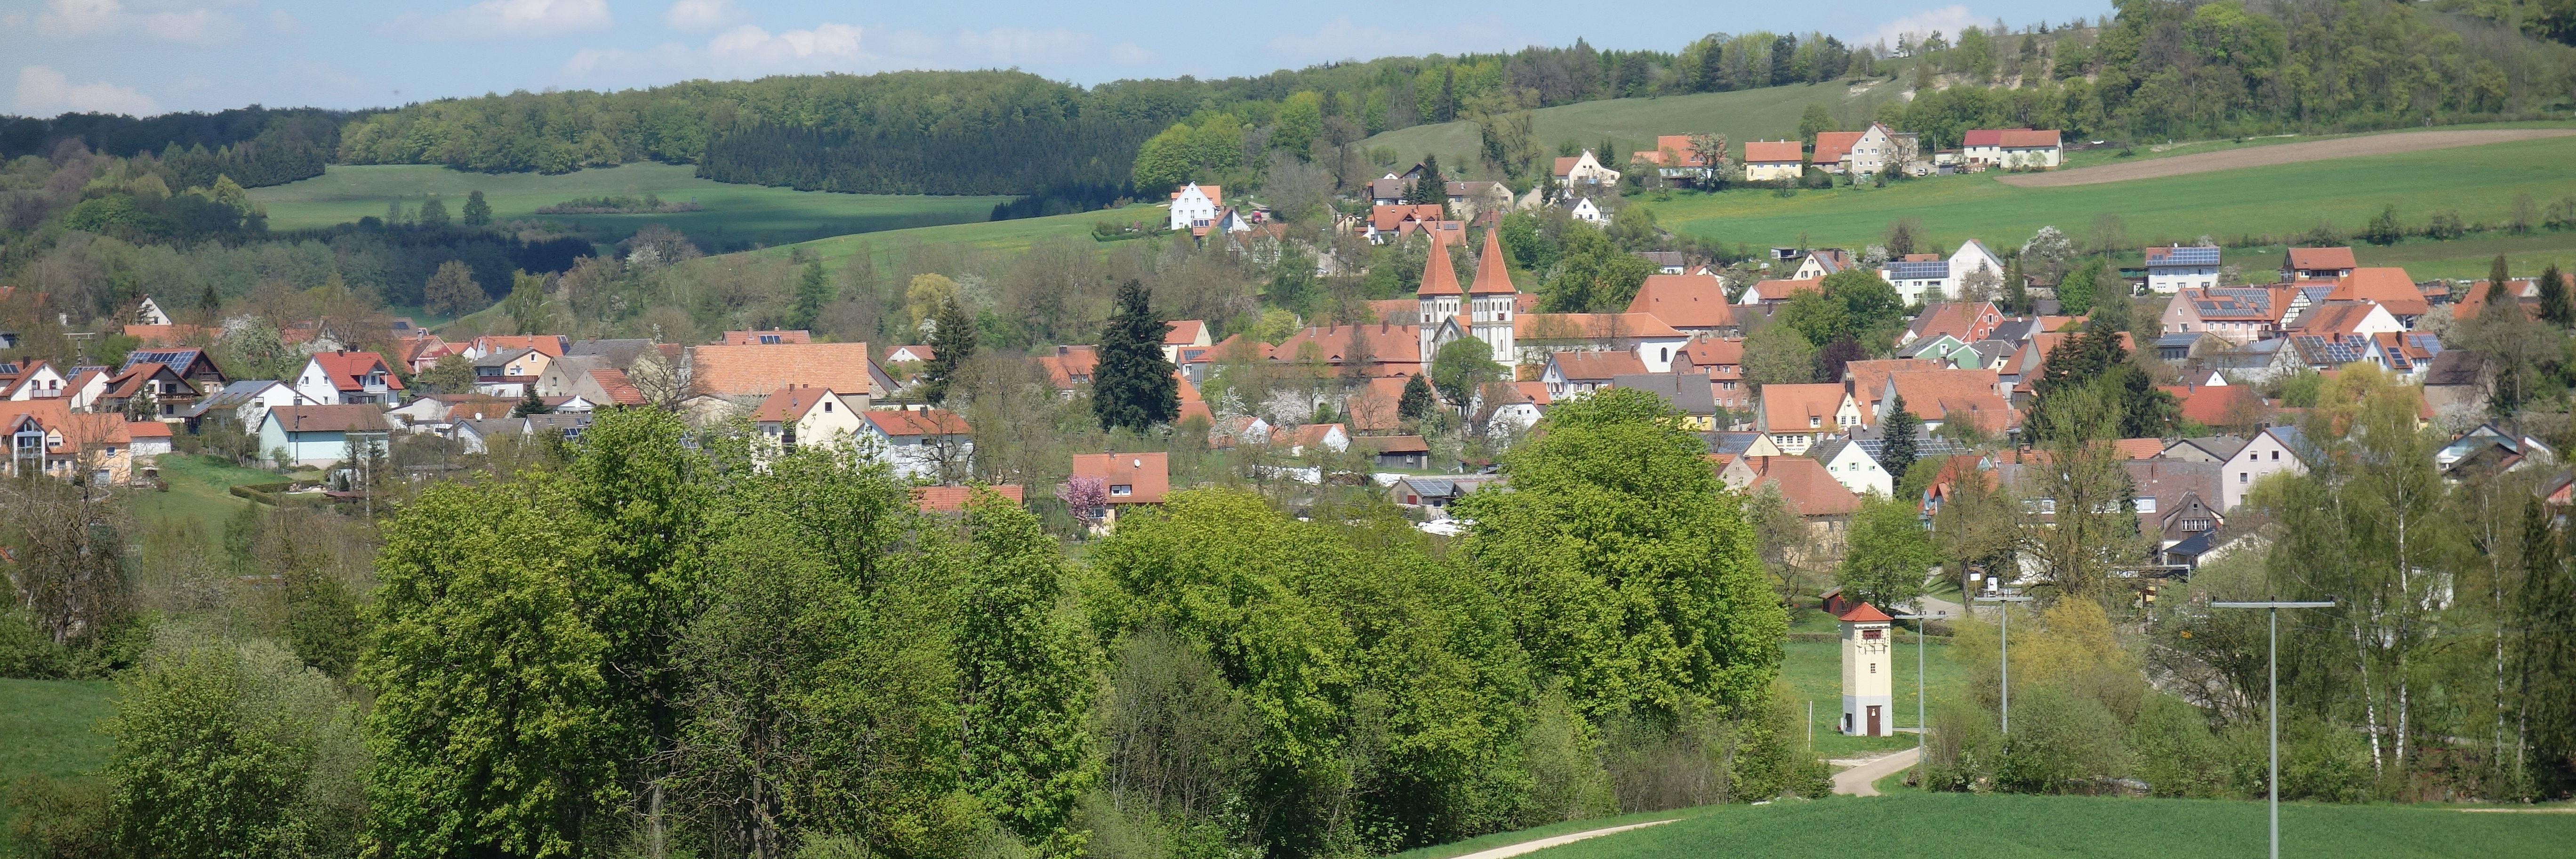 DГјsseldorf Heidenheim